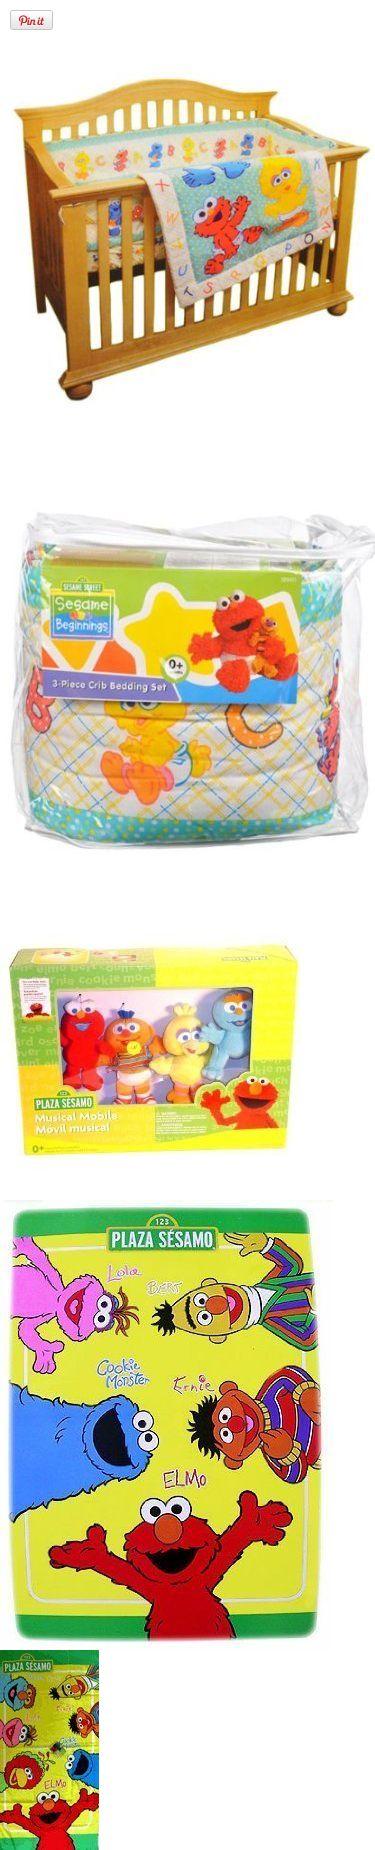 12pcs Deluxe Sesame Street Elmo Baby Crib Bedding Set Musical Mobile, Rug,  Towel + Extras, U2022Beautiful Custom 12 Pieces Unisex Baby Gift Set Includes:  U2022One ...